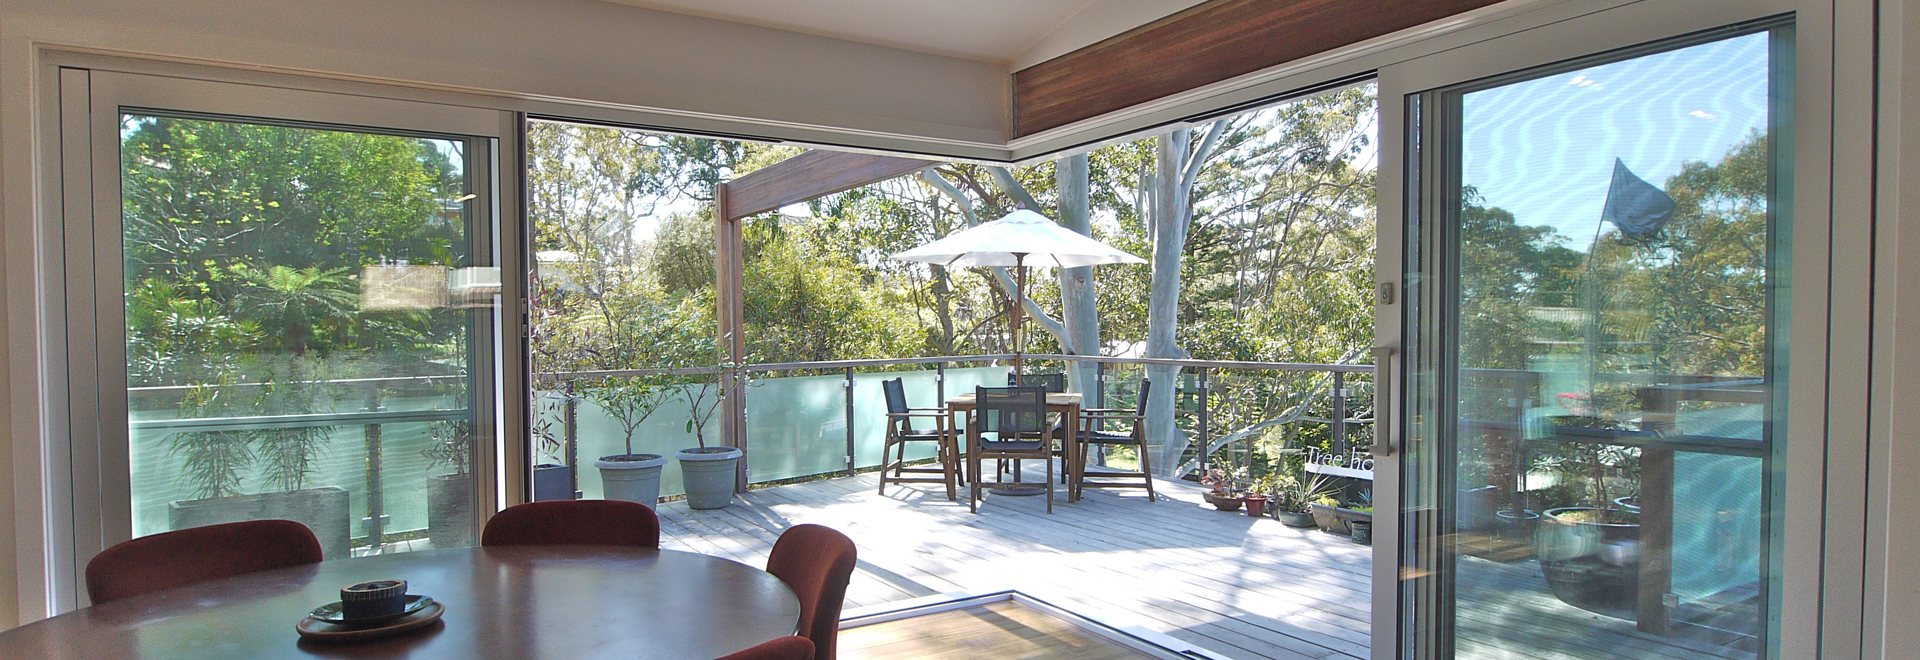 Sustainable house design queensland - Sustainable House Design Queensland 36